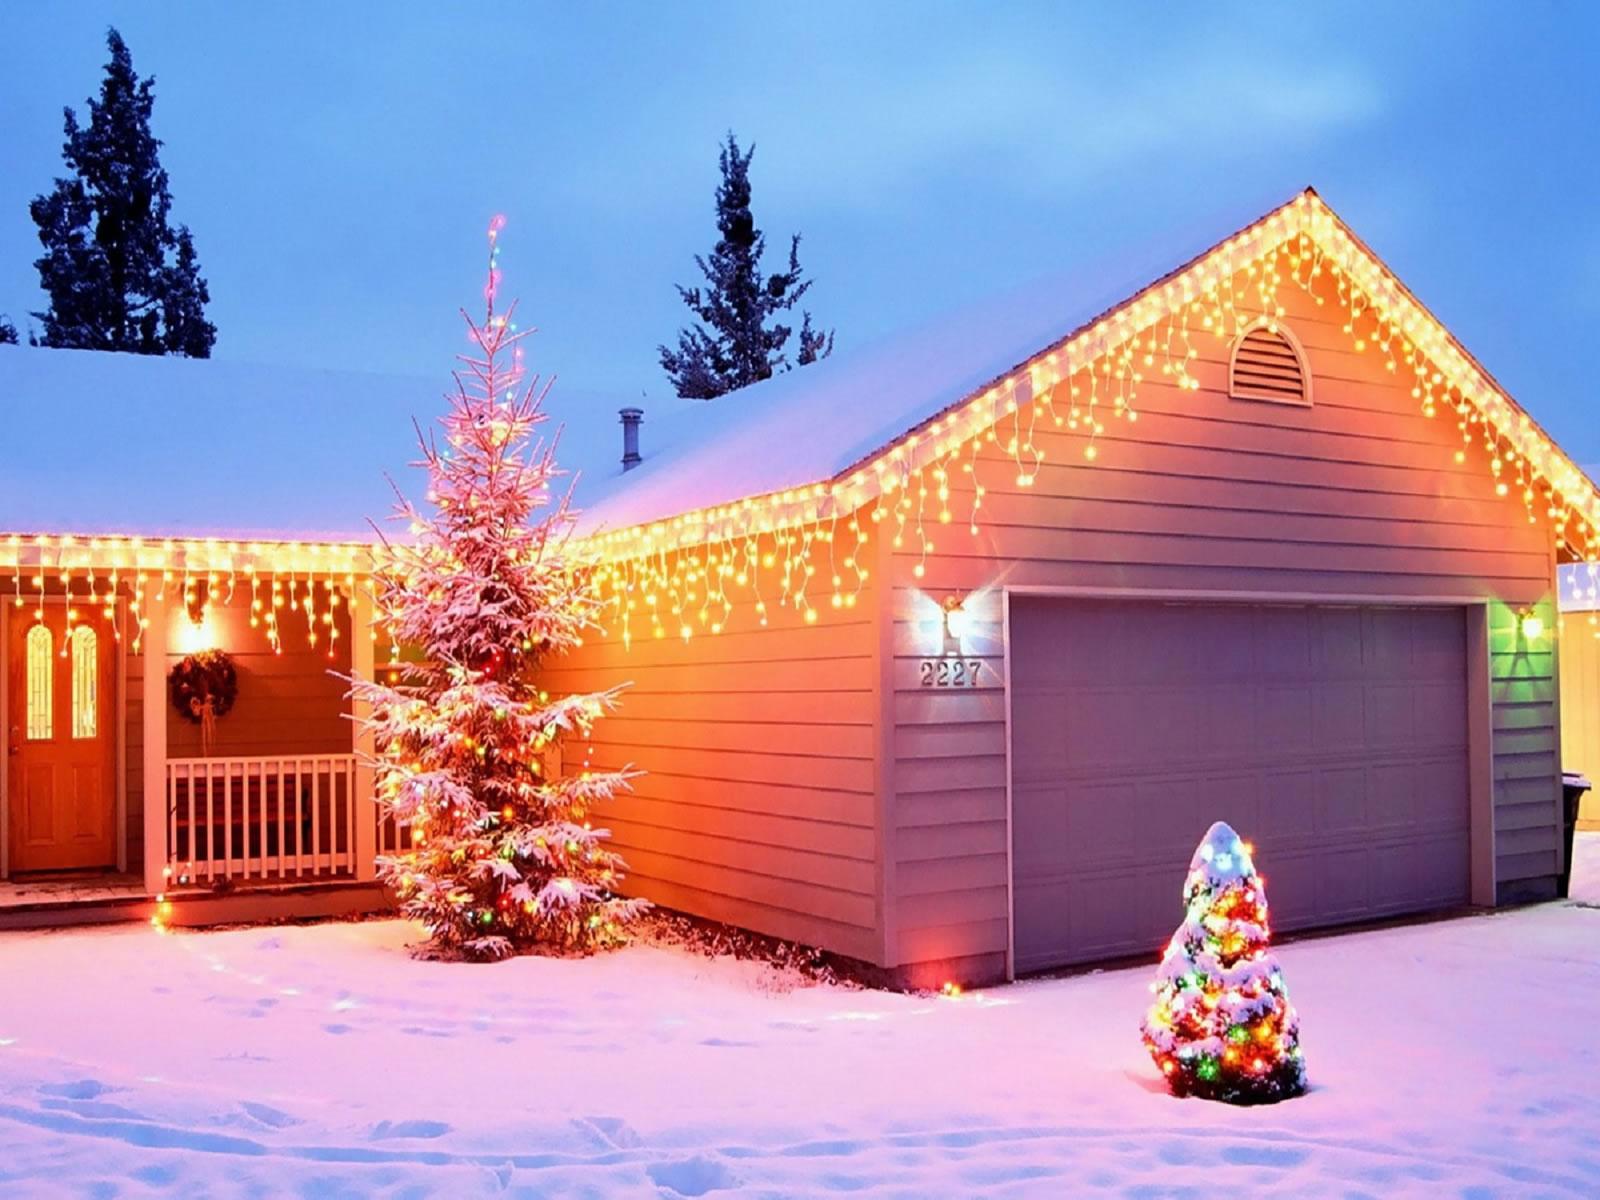 decoracao de natal para interiores de casas:Decoração de Natal – Decoração em Decoracao 10